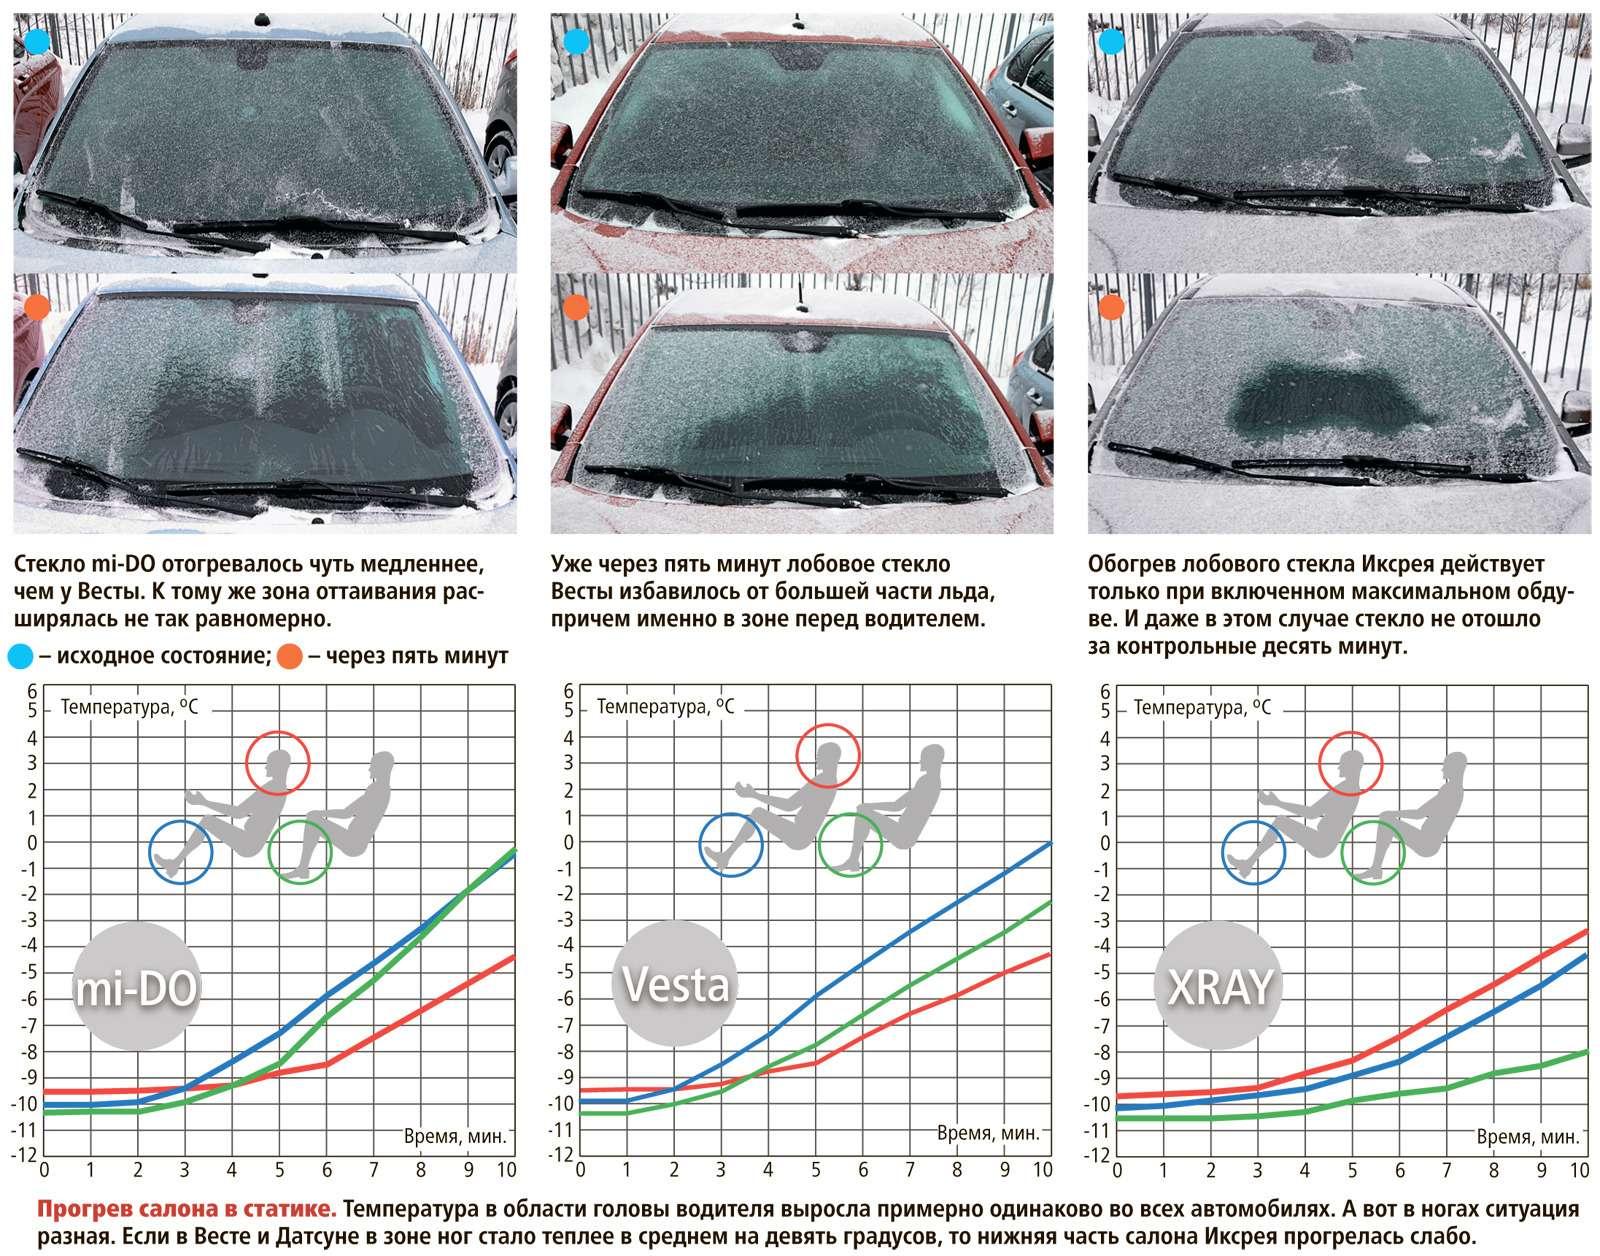 Большой зимний тест: Lada Vesta, Lada XRAY иDatsun mi-DO изпарка ЗР— фото 571523